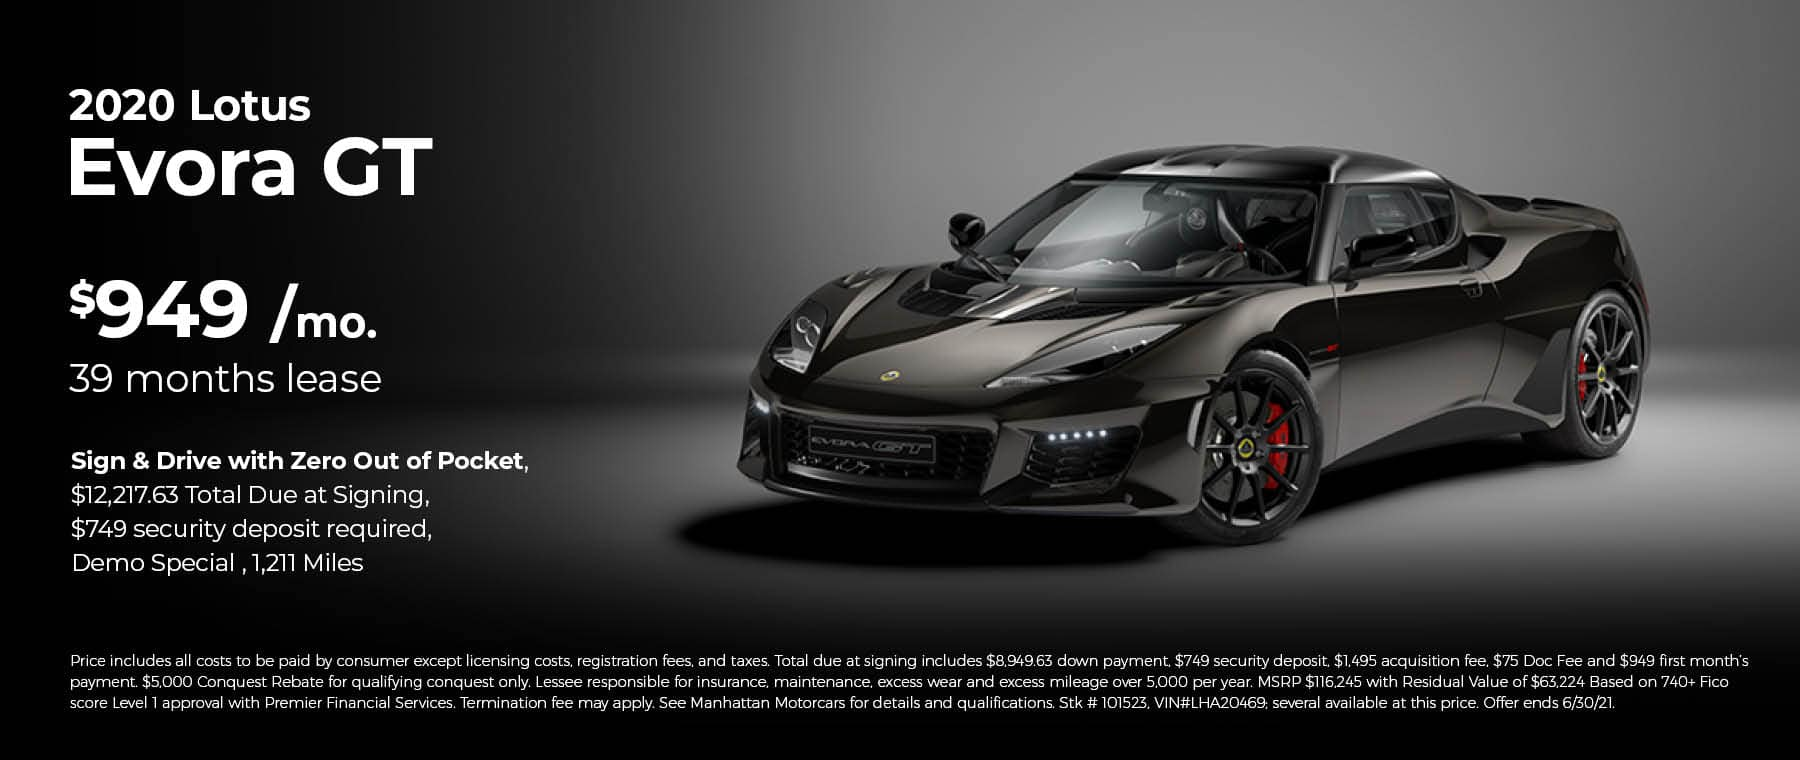 MMC-Exotics-Lotus 1800 x 760 June 2021 Evora GT